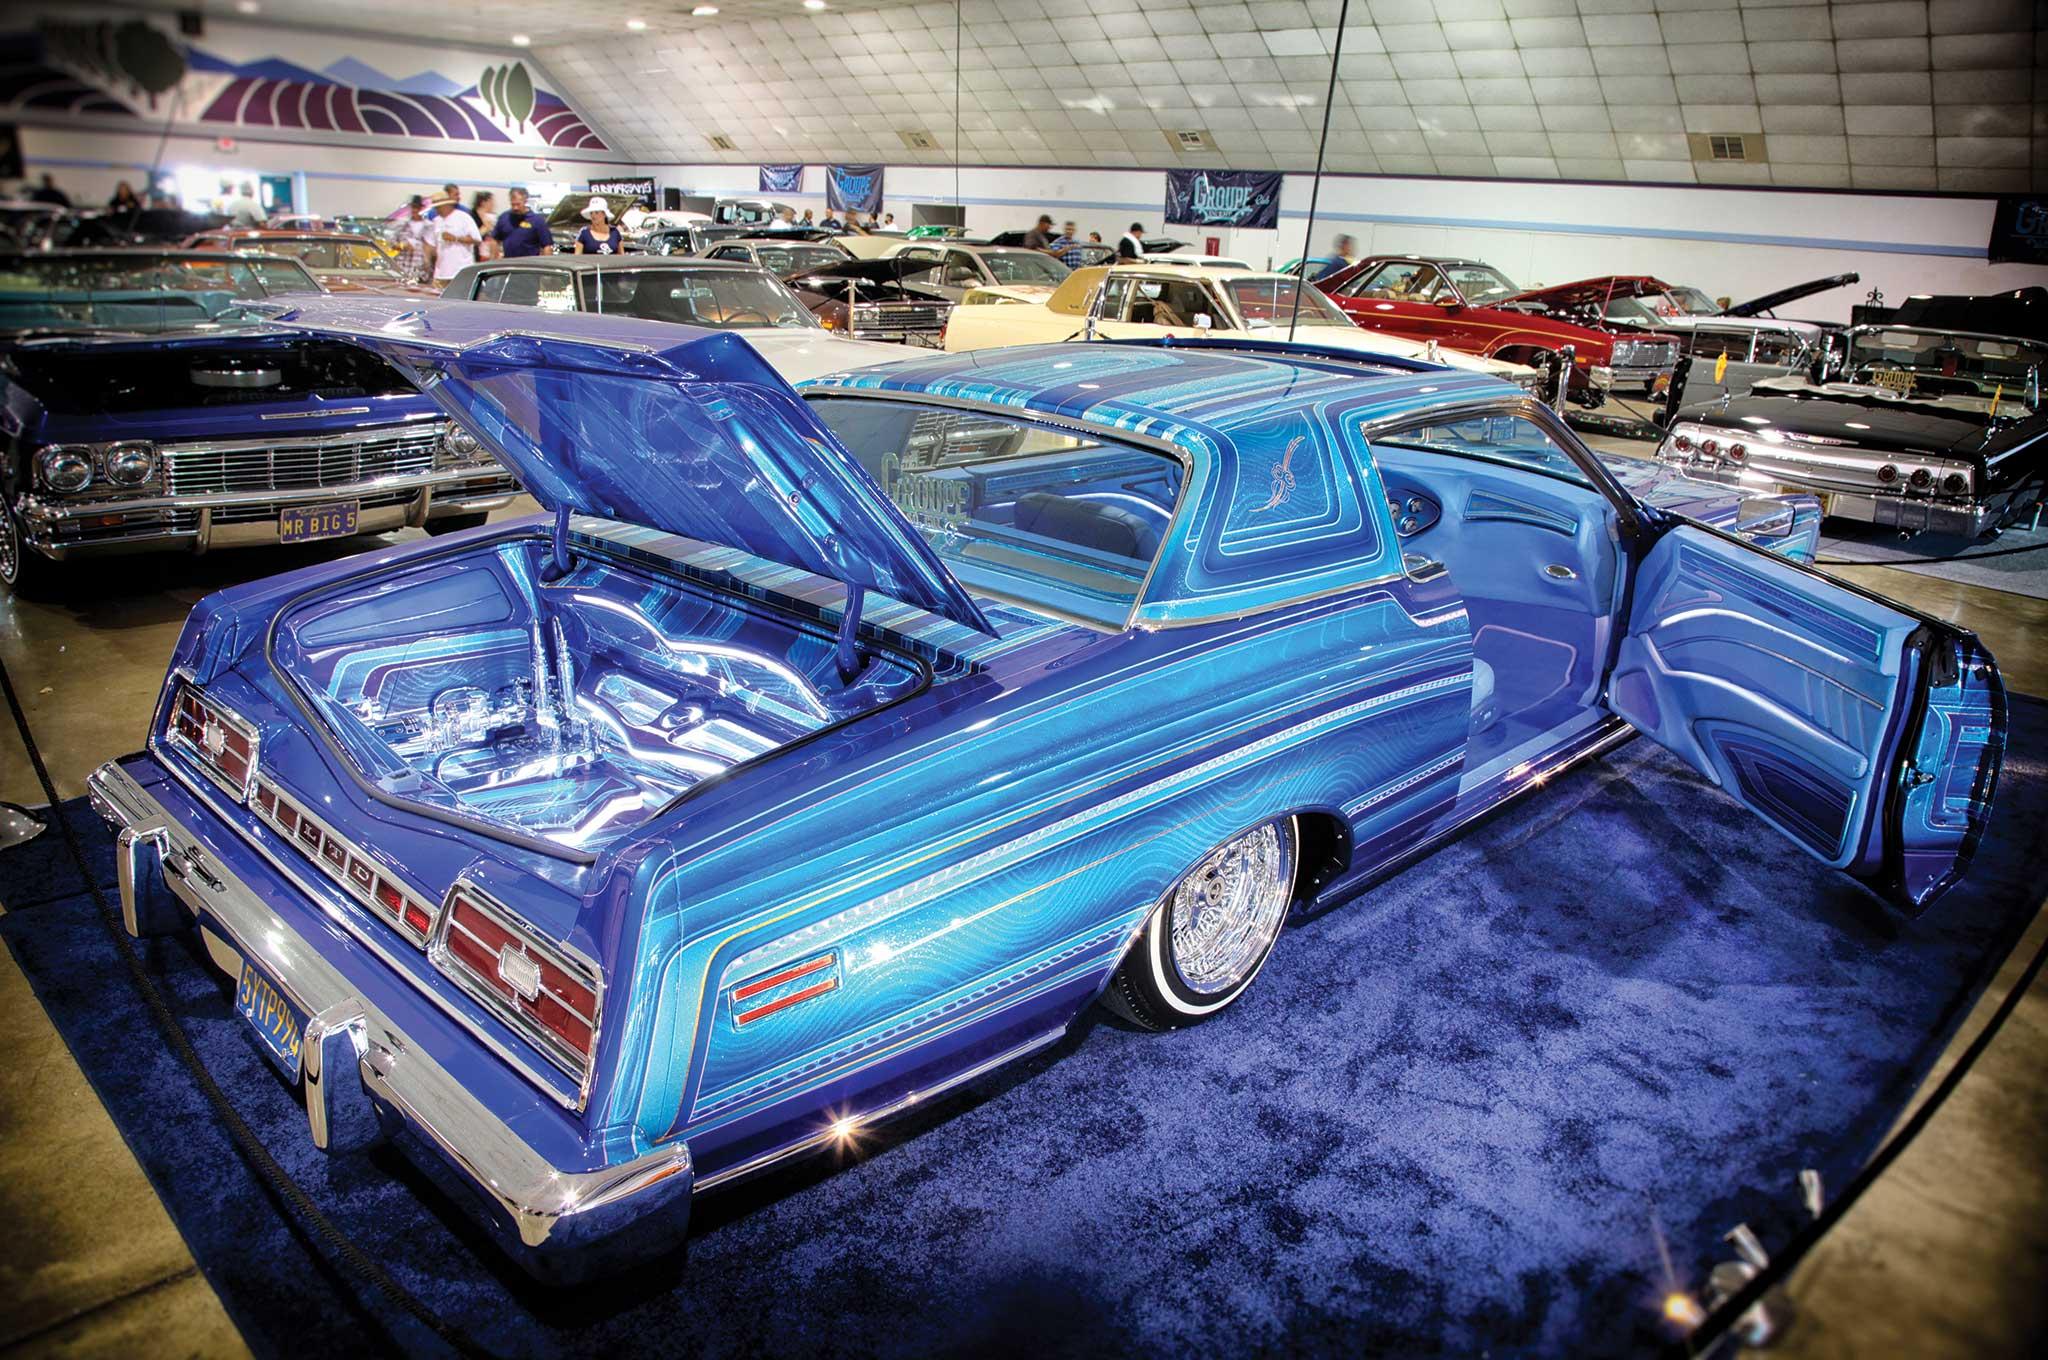 Carnales Unidos Bakersfield Super Show Lowrider - Bakersfield car show